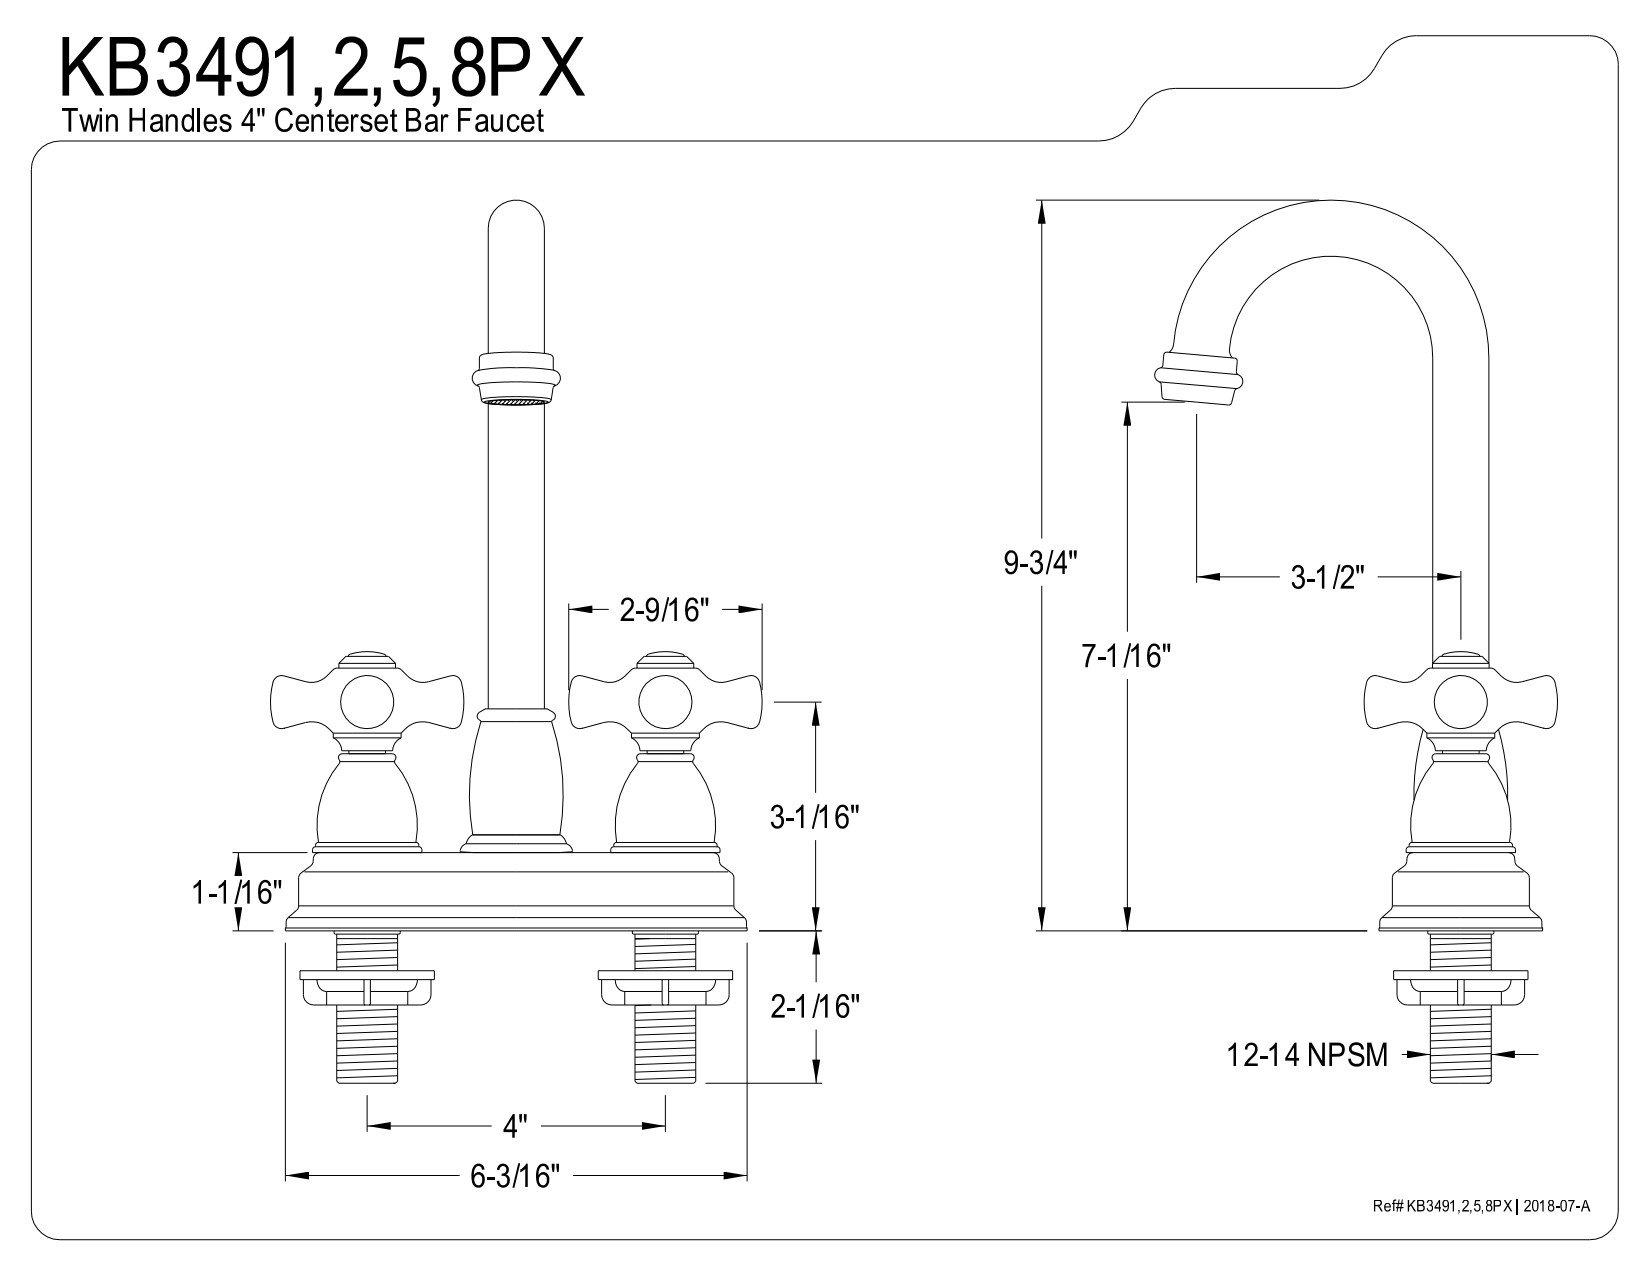 Kingston Brass KB3491PX Restoration Centerset Bar Faucet, 4-Inch, Polished Chrome by Kingston Brass